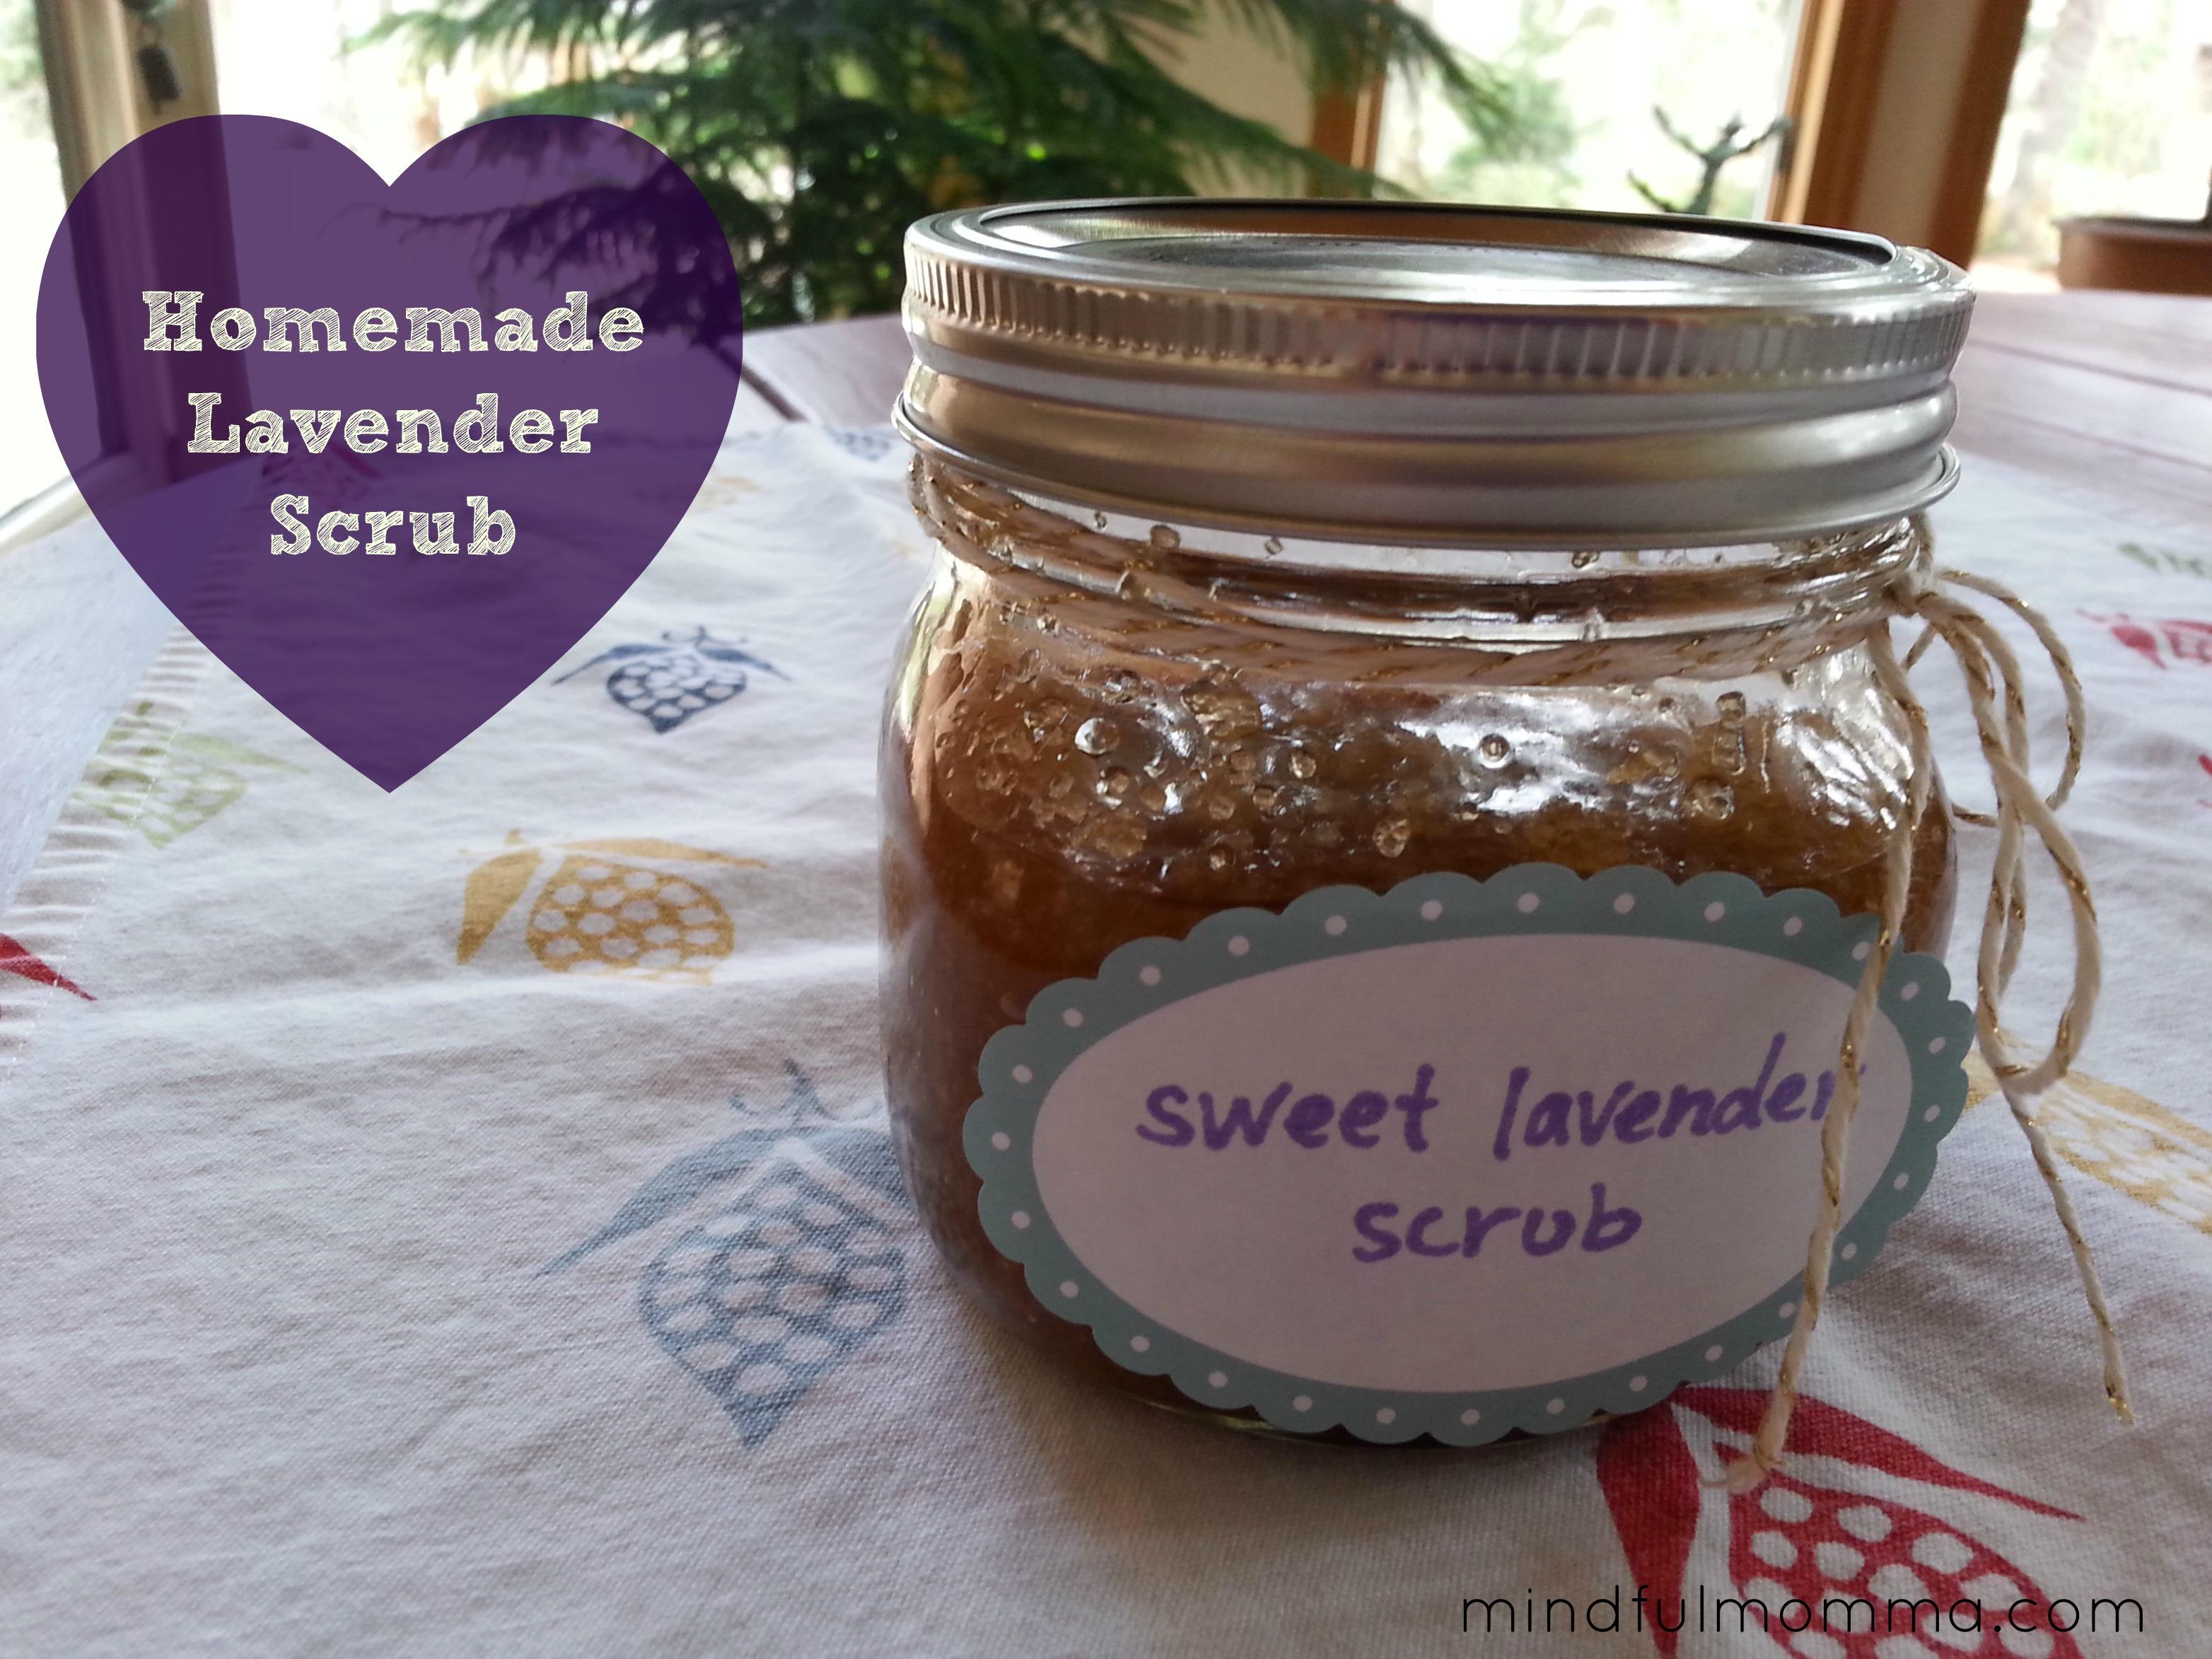 Homemade Lavender Scrub via Mindfulmomma.com